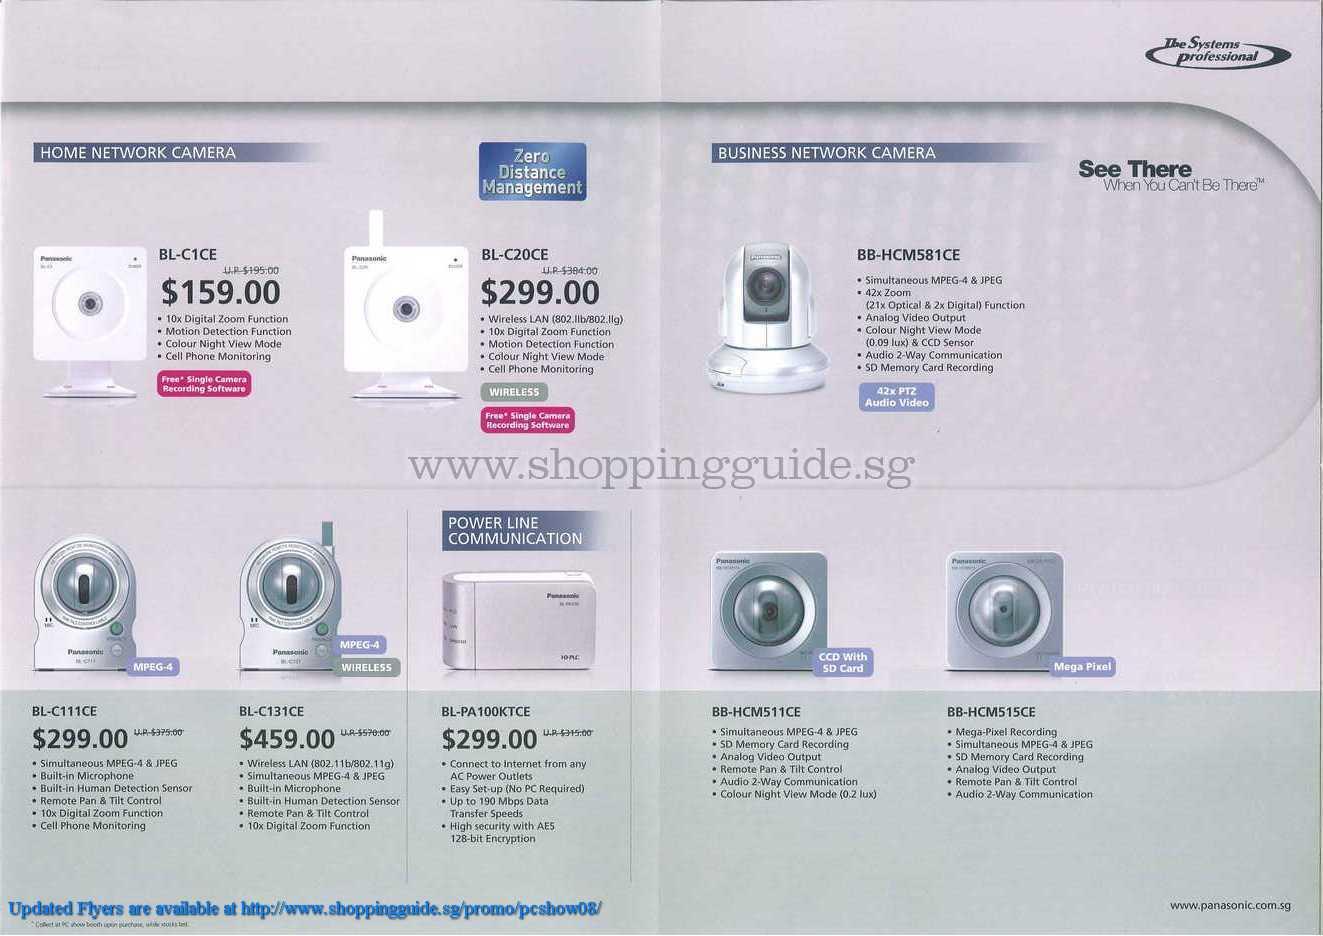 PC Show 2008 price list image brochure of Panasonic Camera Powerline ShoppingGuide.SG-PcShow08-100